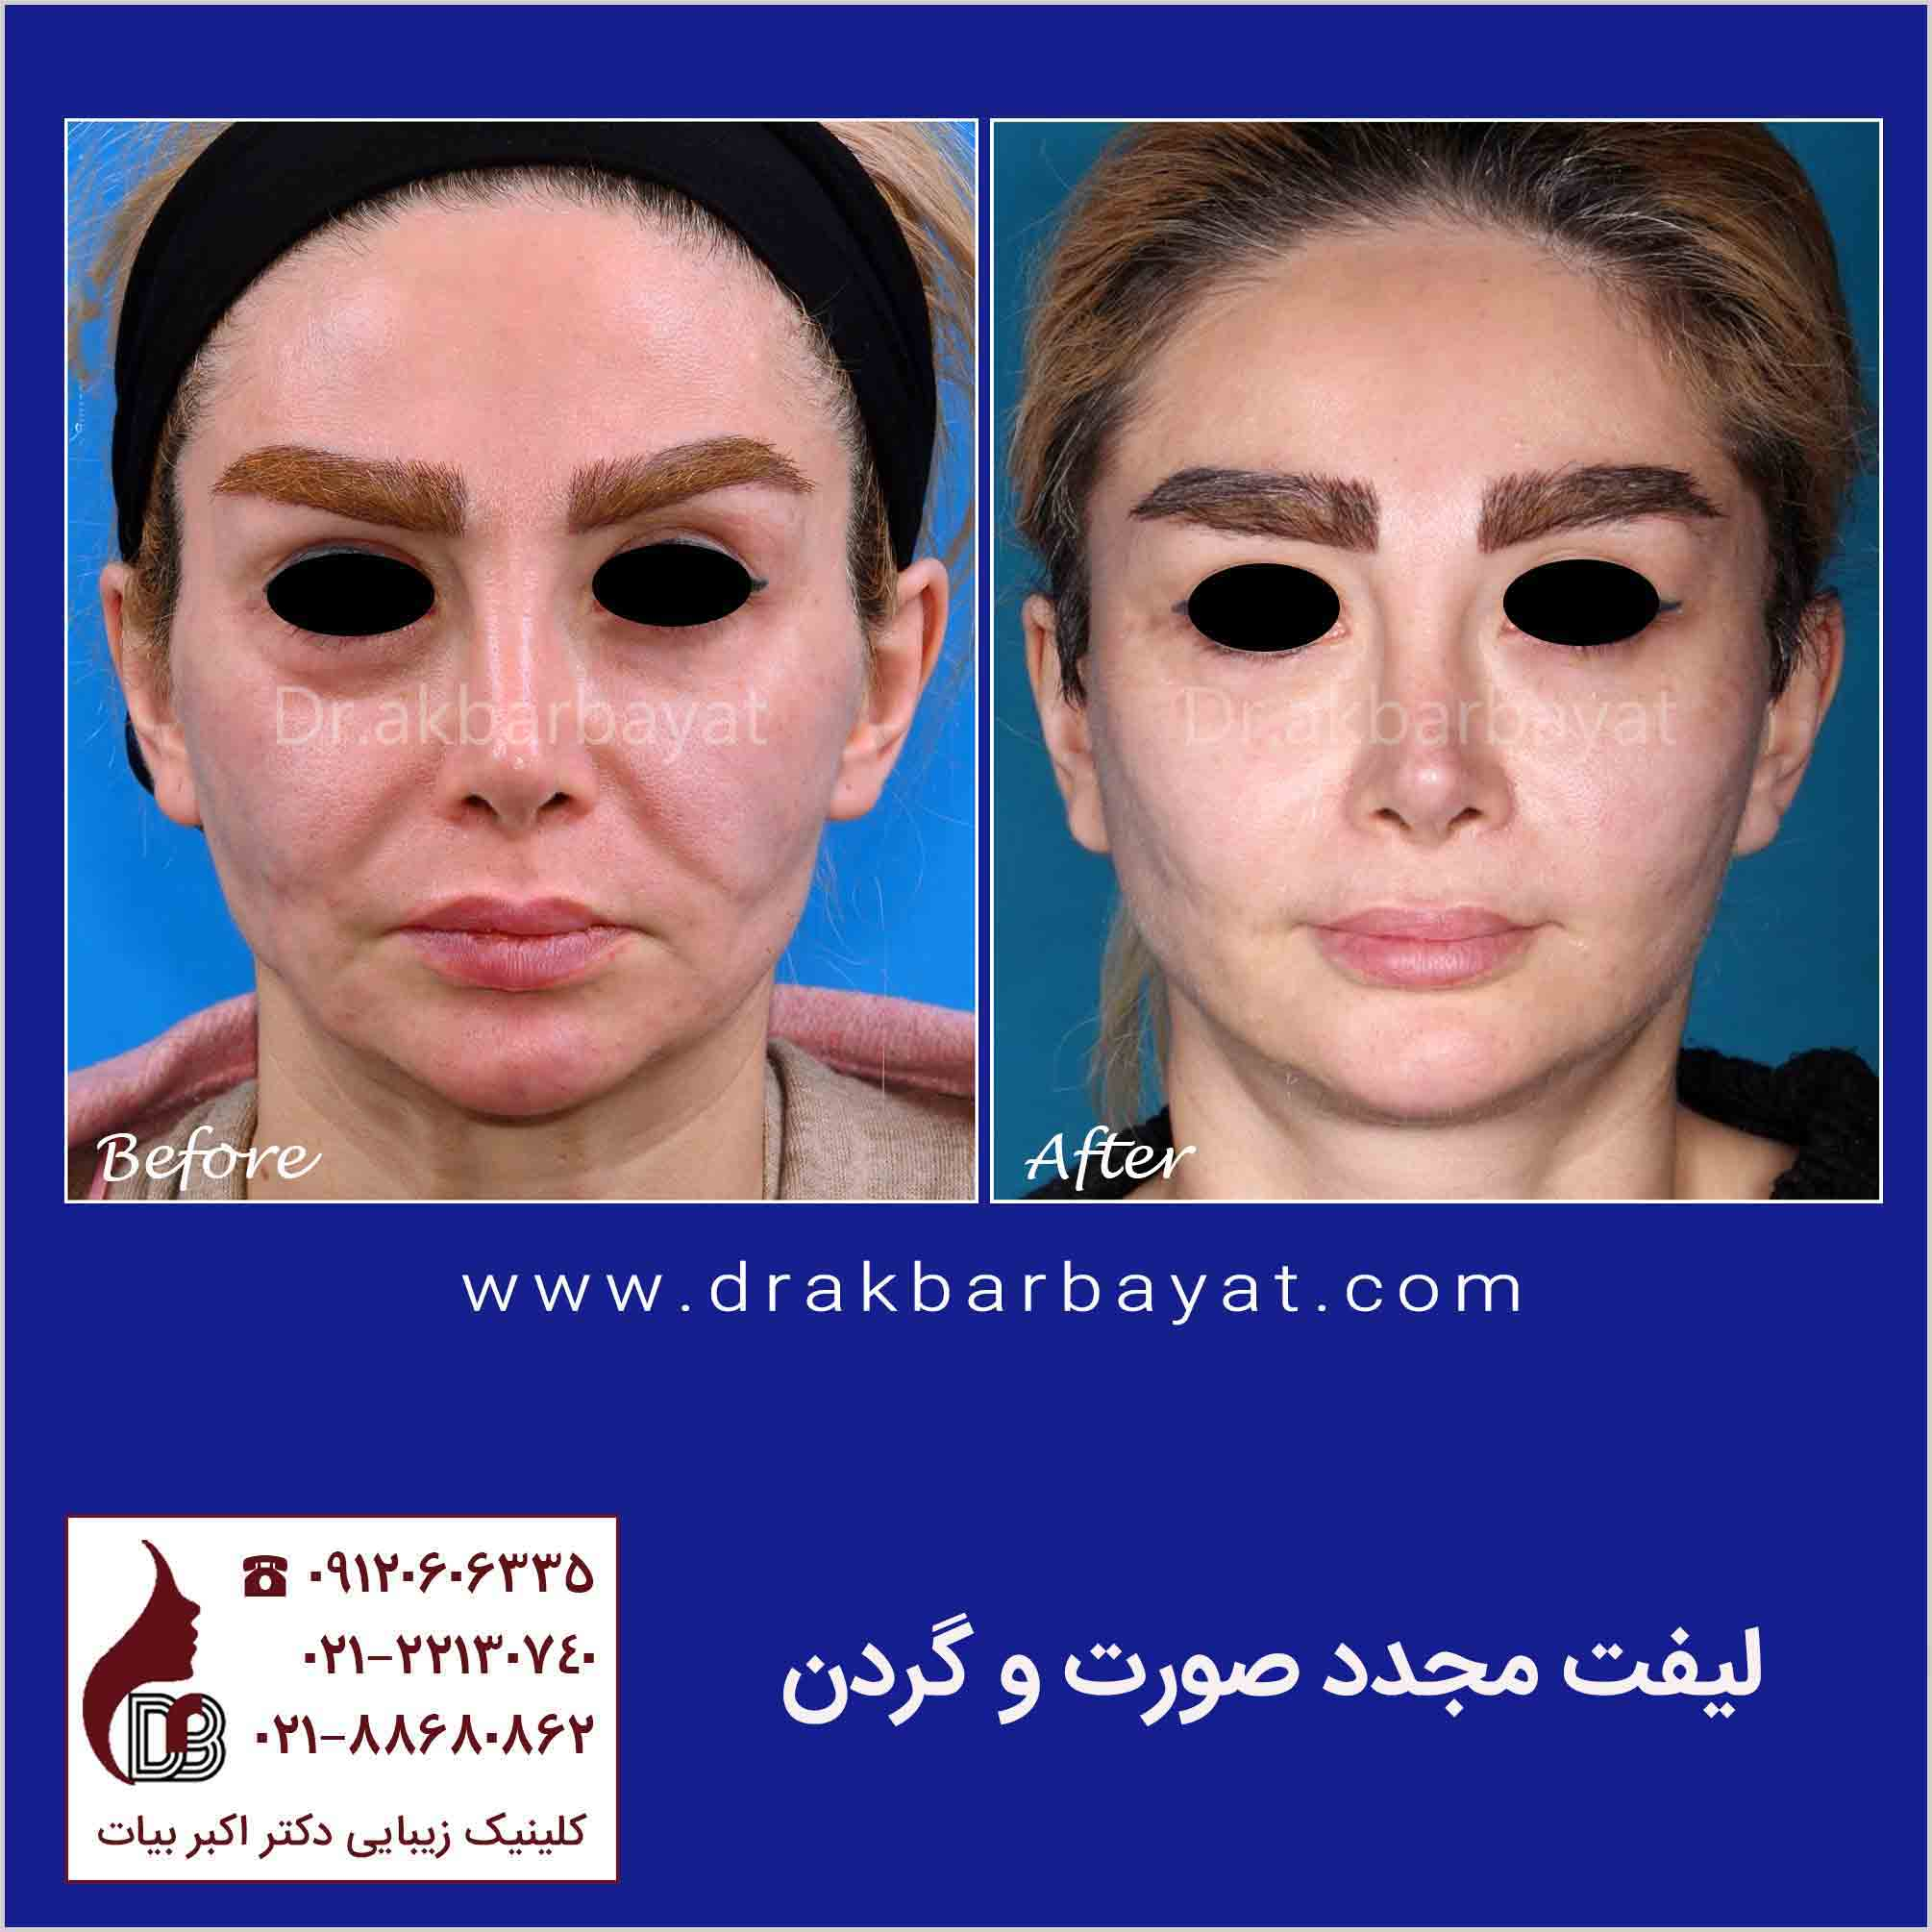 جراحی مجدد لیفت صورت | جراحی مجدد لیفتینگ صورت | بهترین جراح لیفت صورت در تهران